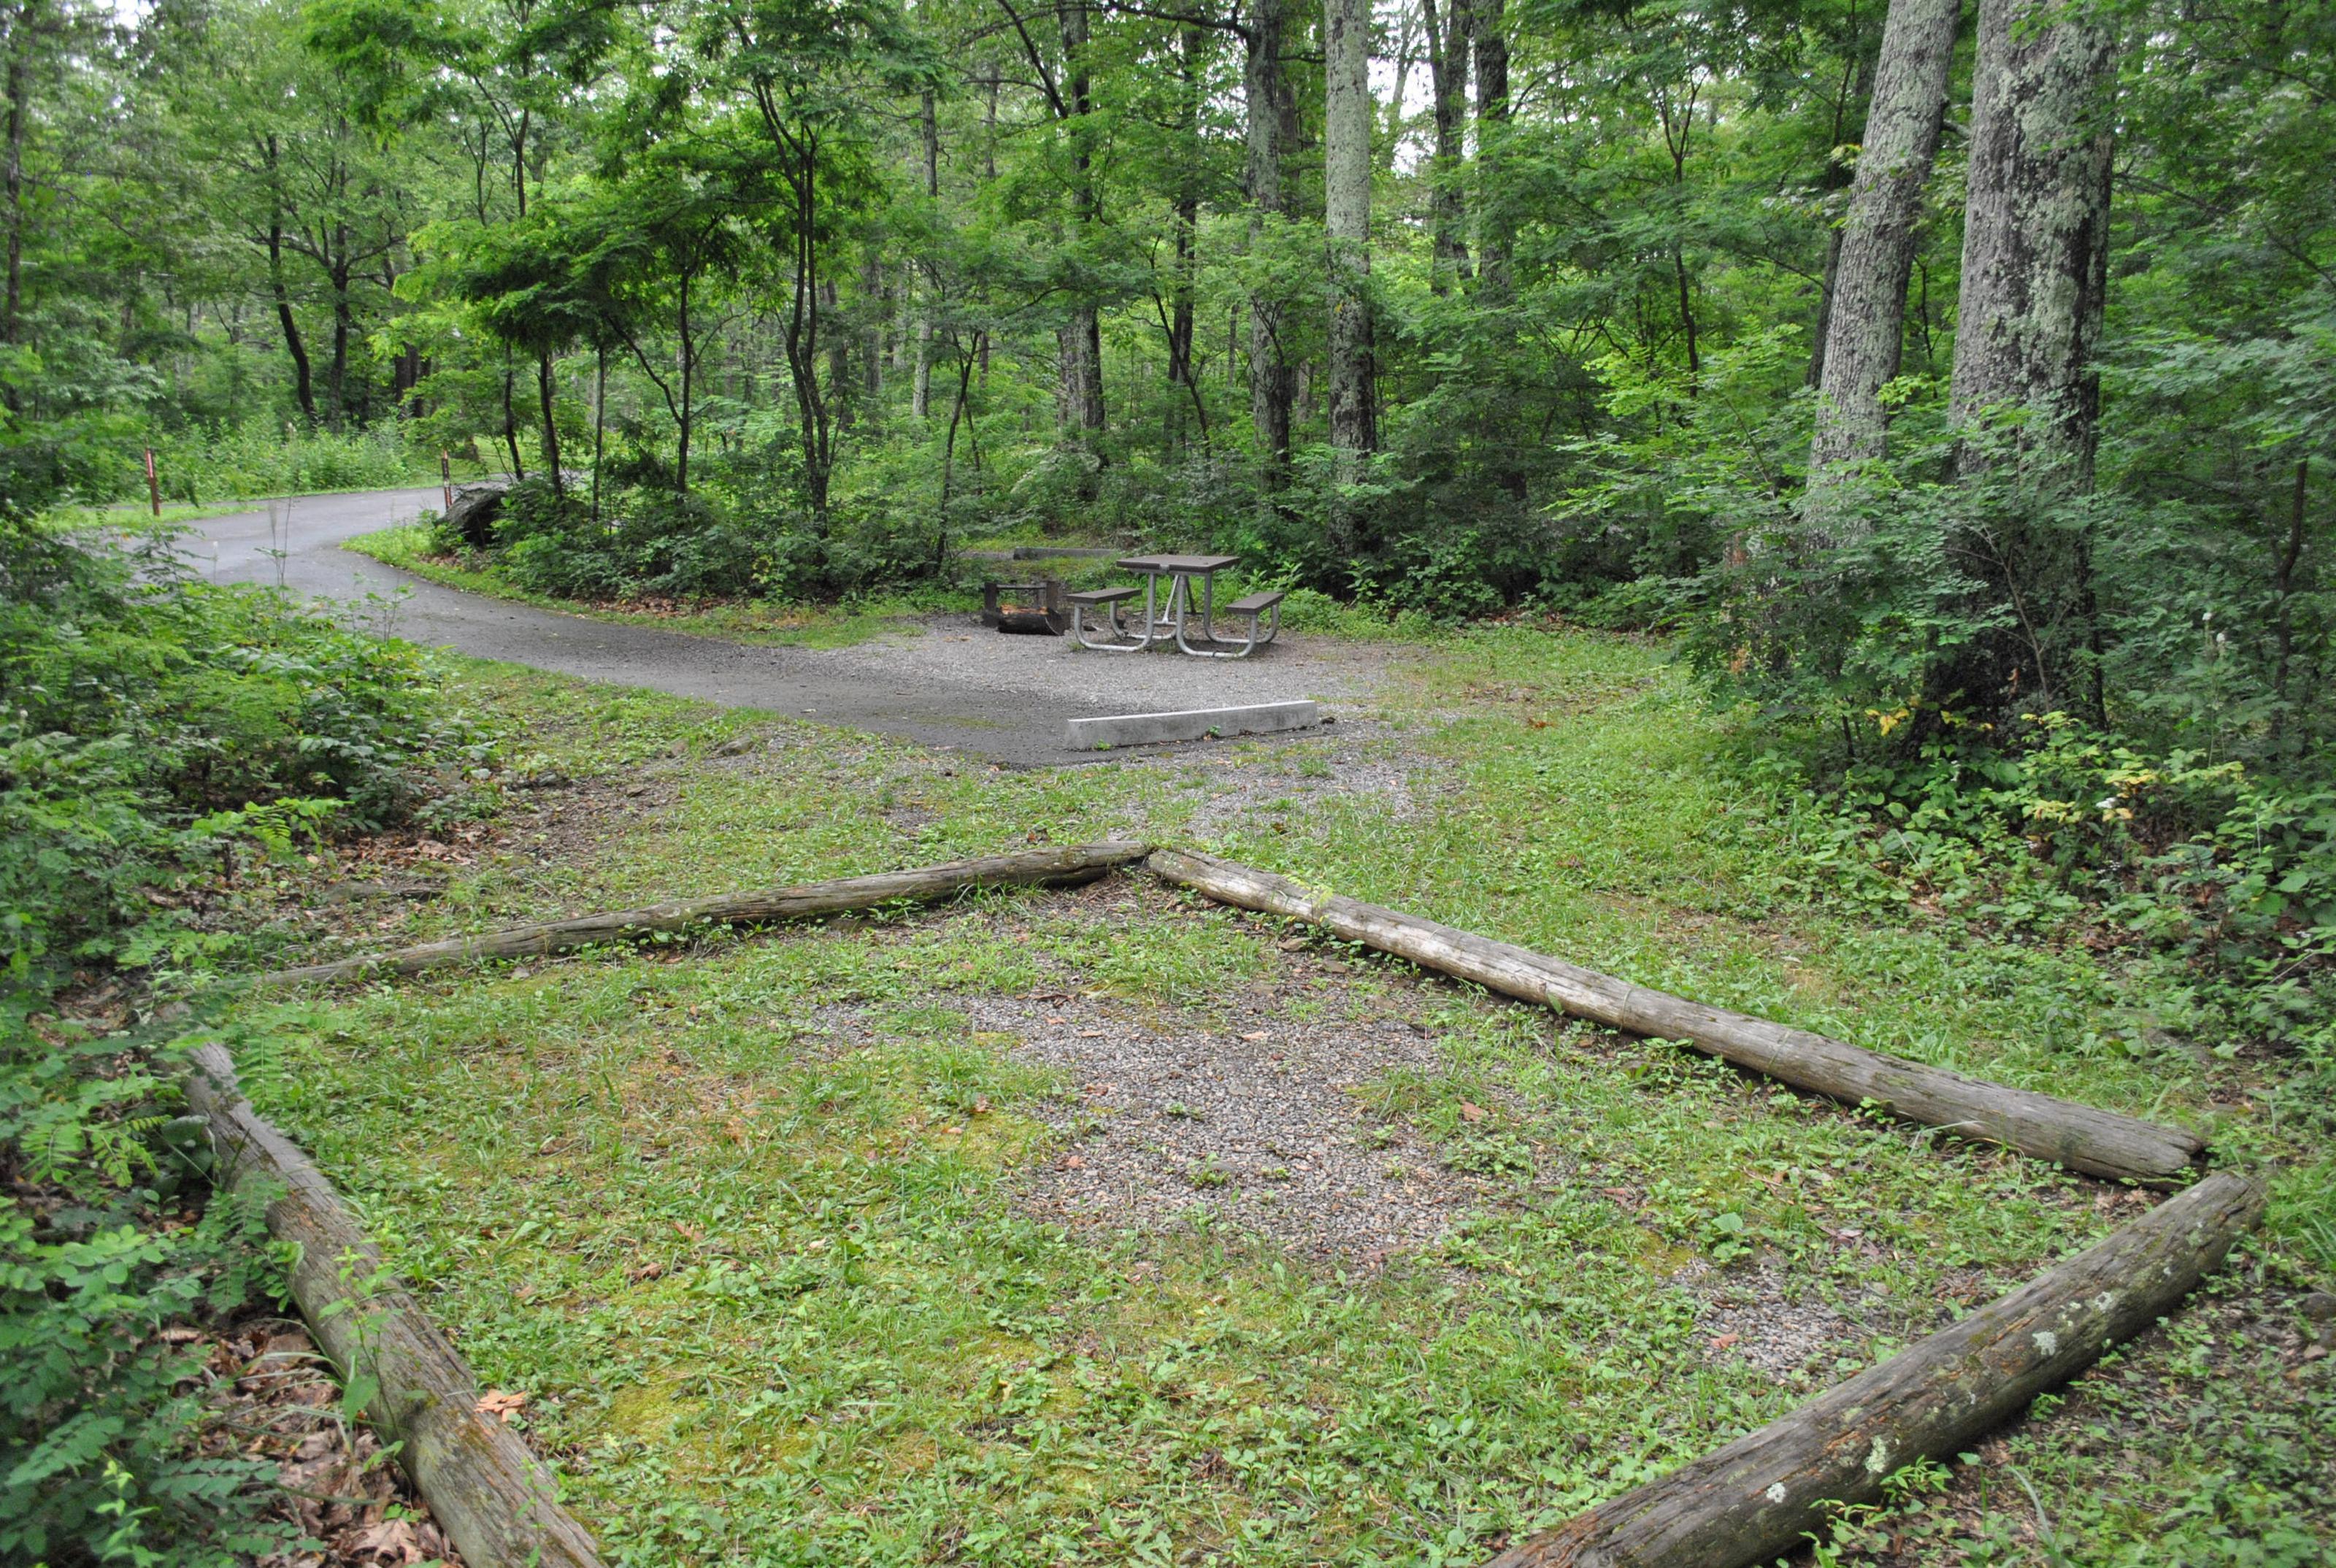 Mathews Arm Campground - Site C152